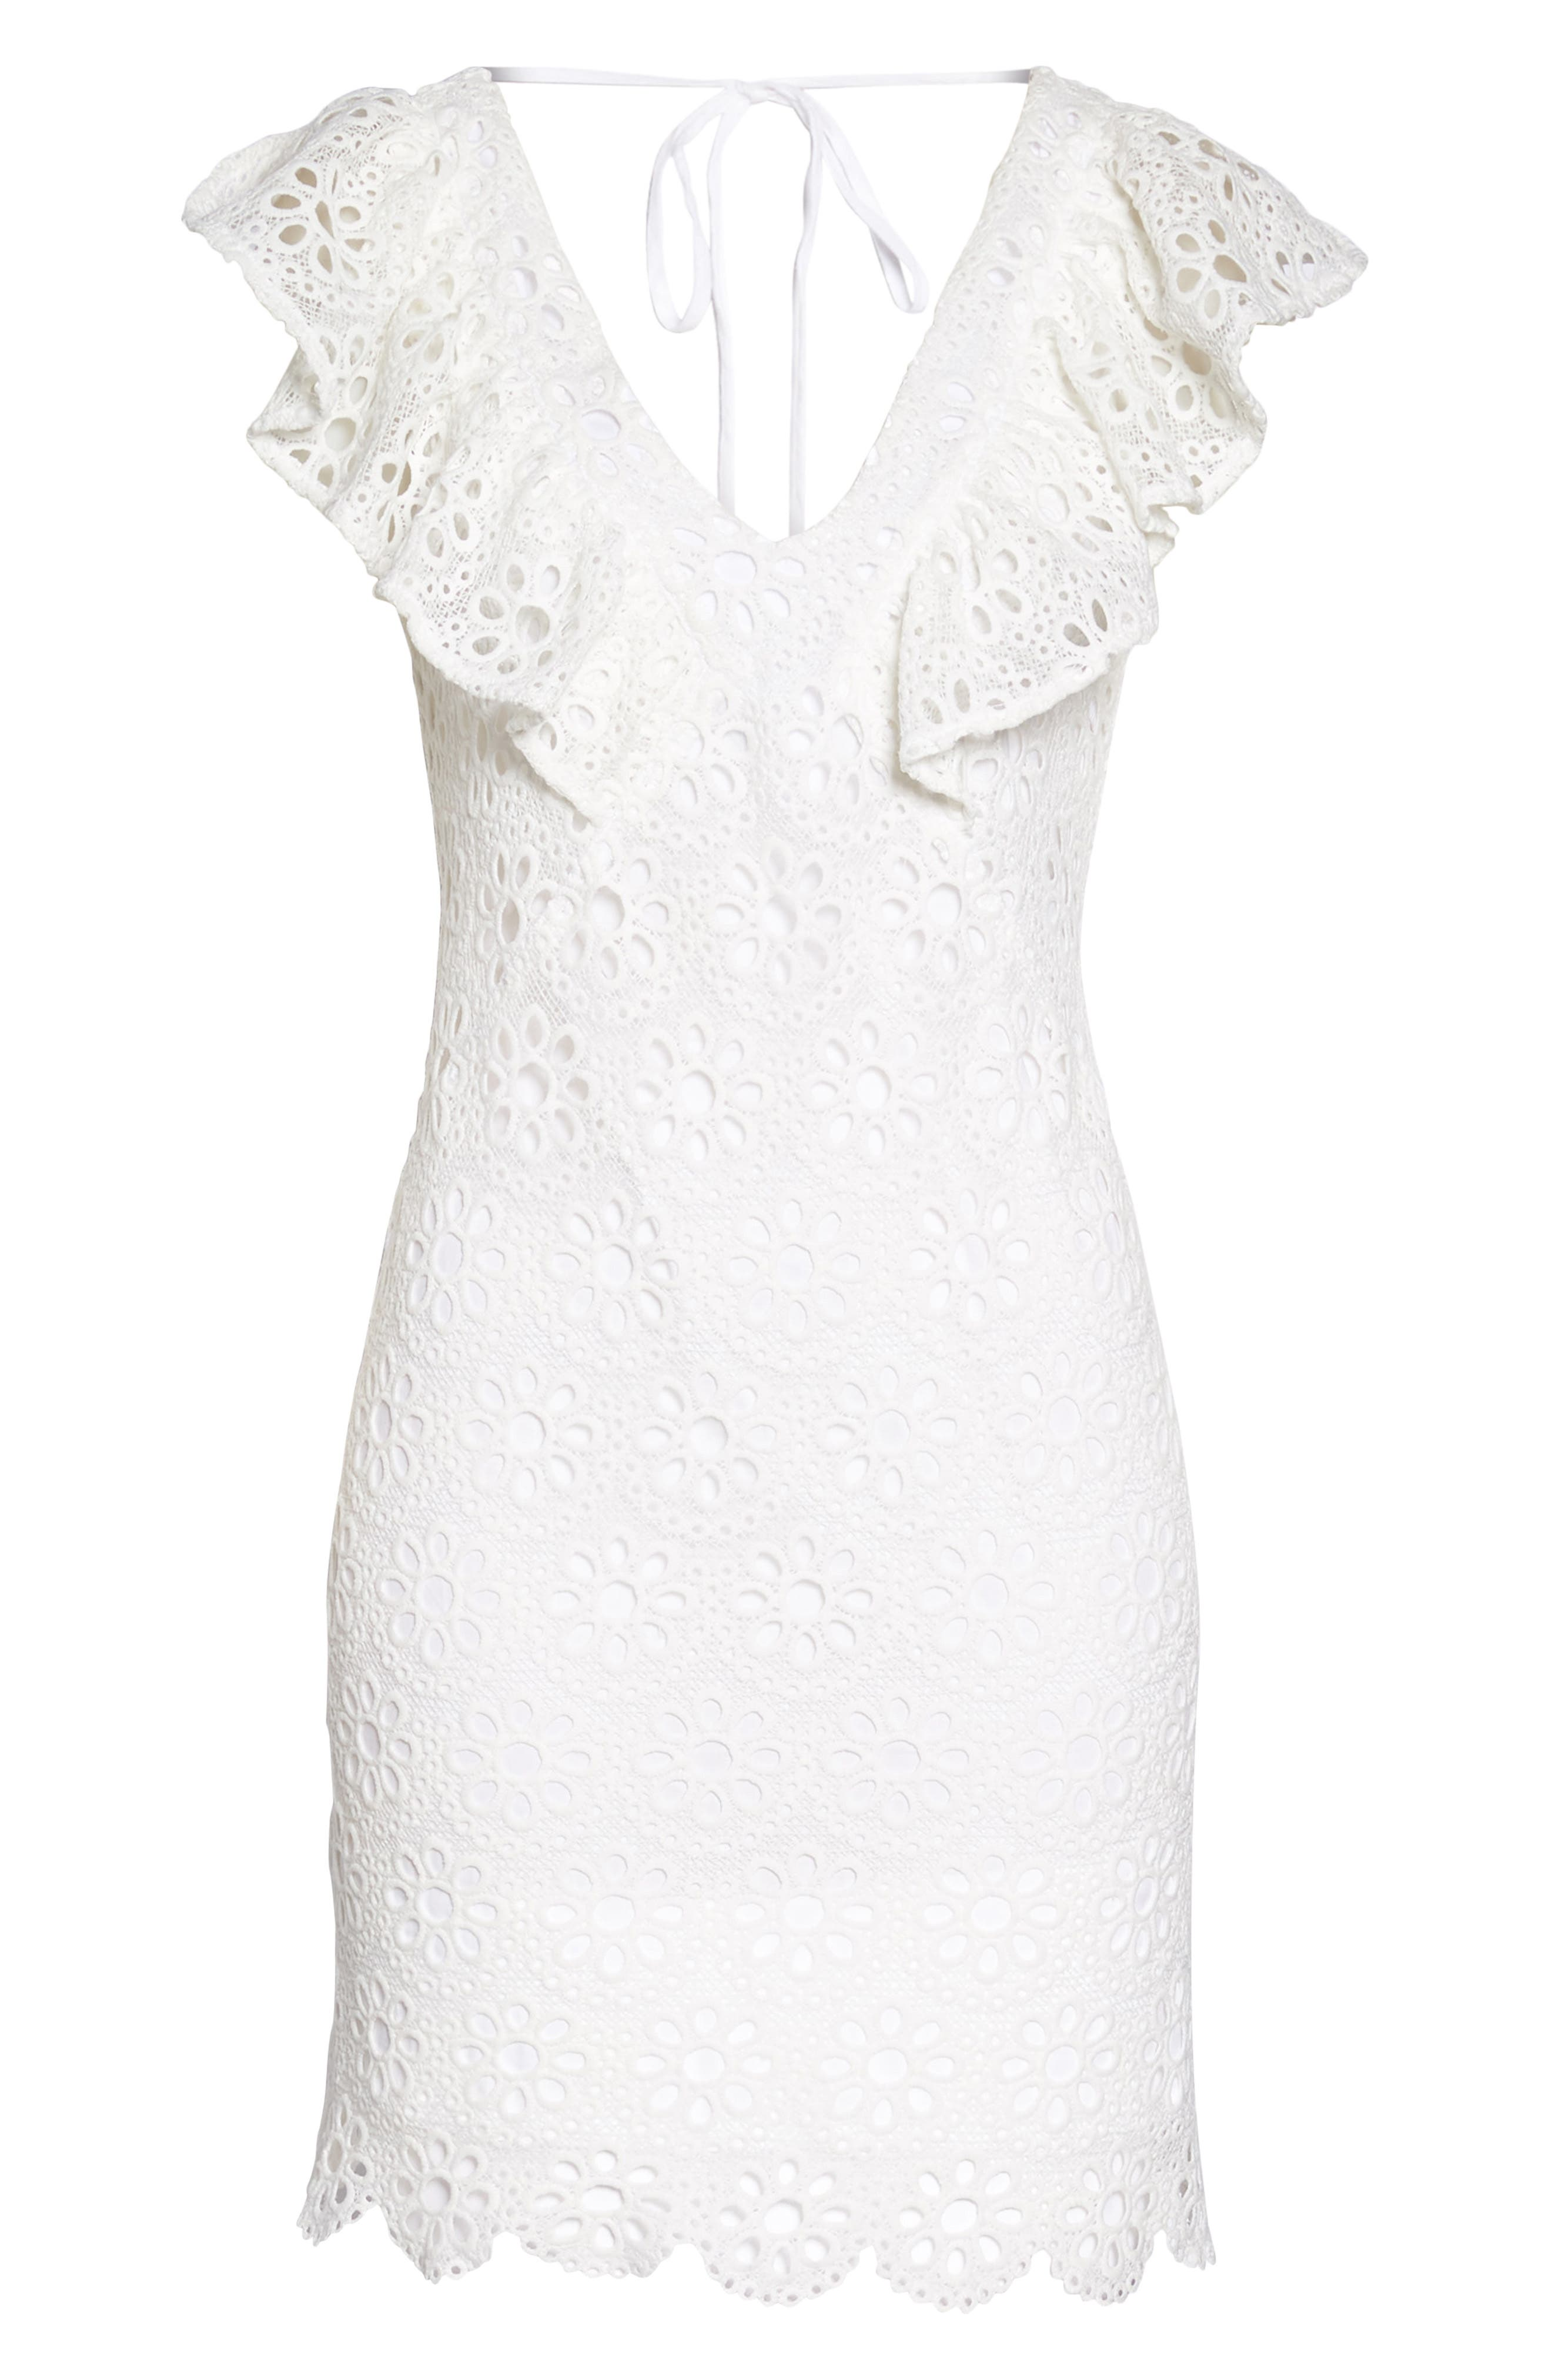 Neriah Eyelet Embroidered Dress,                             Alternate thumbnail 7, color,                             Whitewash